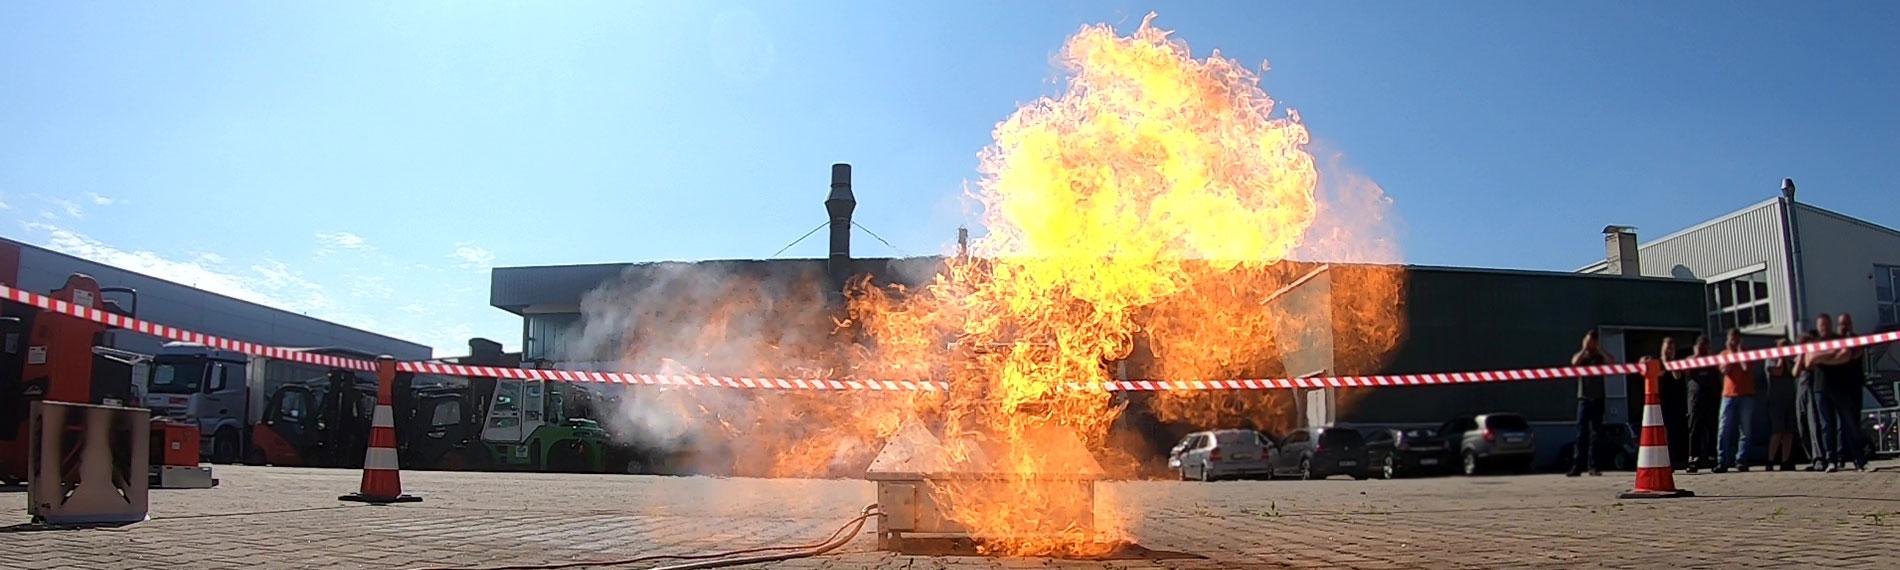 Explosion Brandschutzhelfer Gruma Akademie hero1